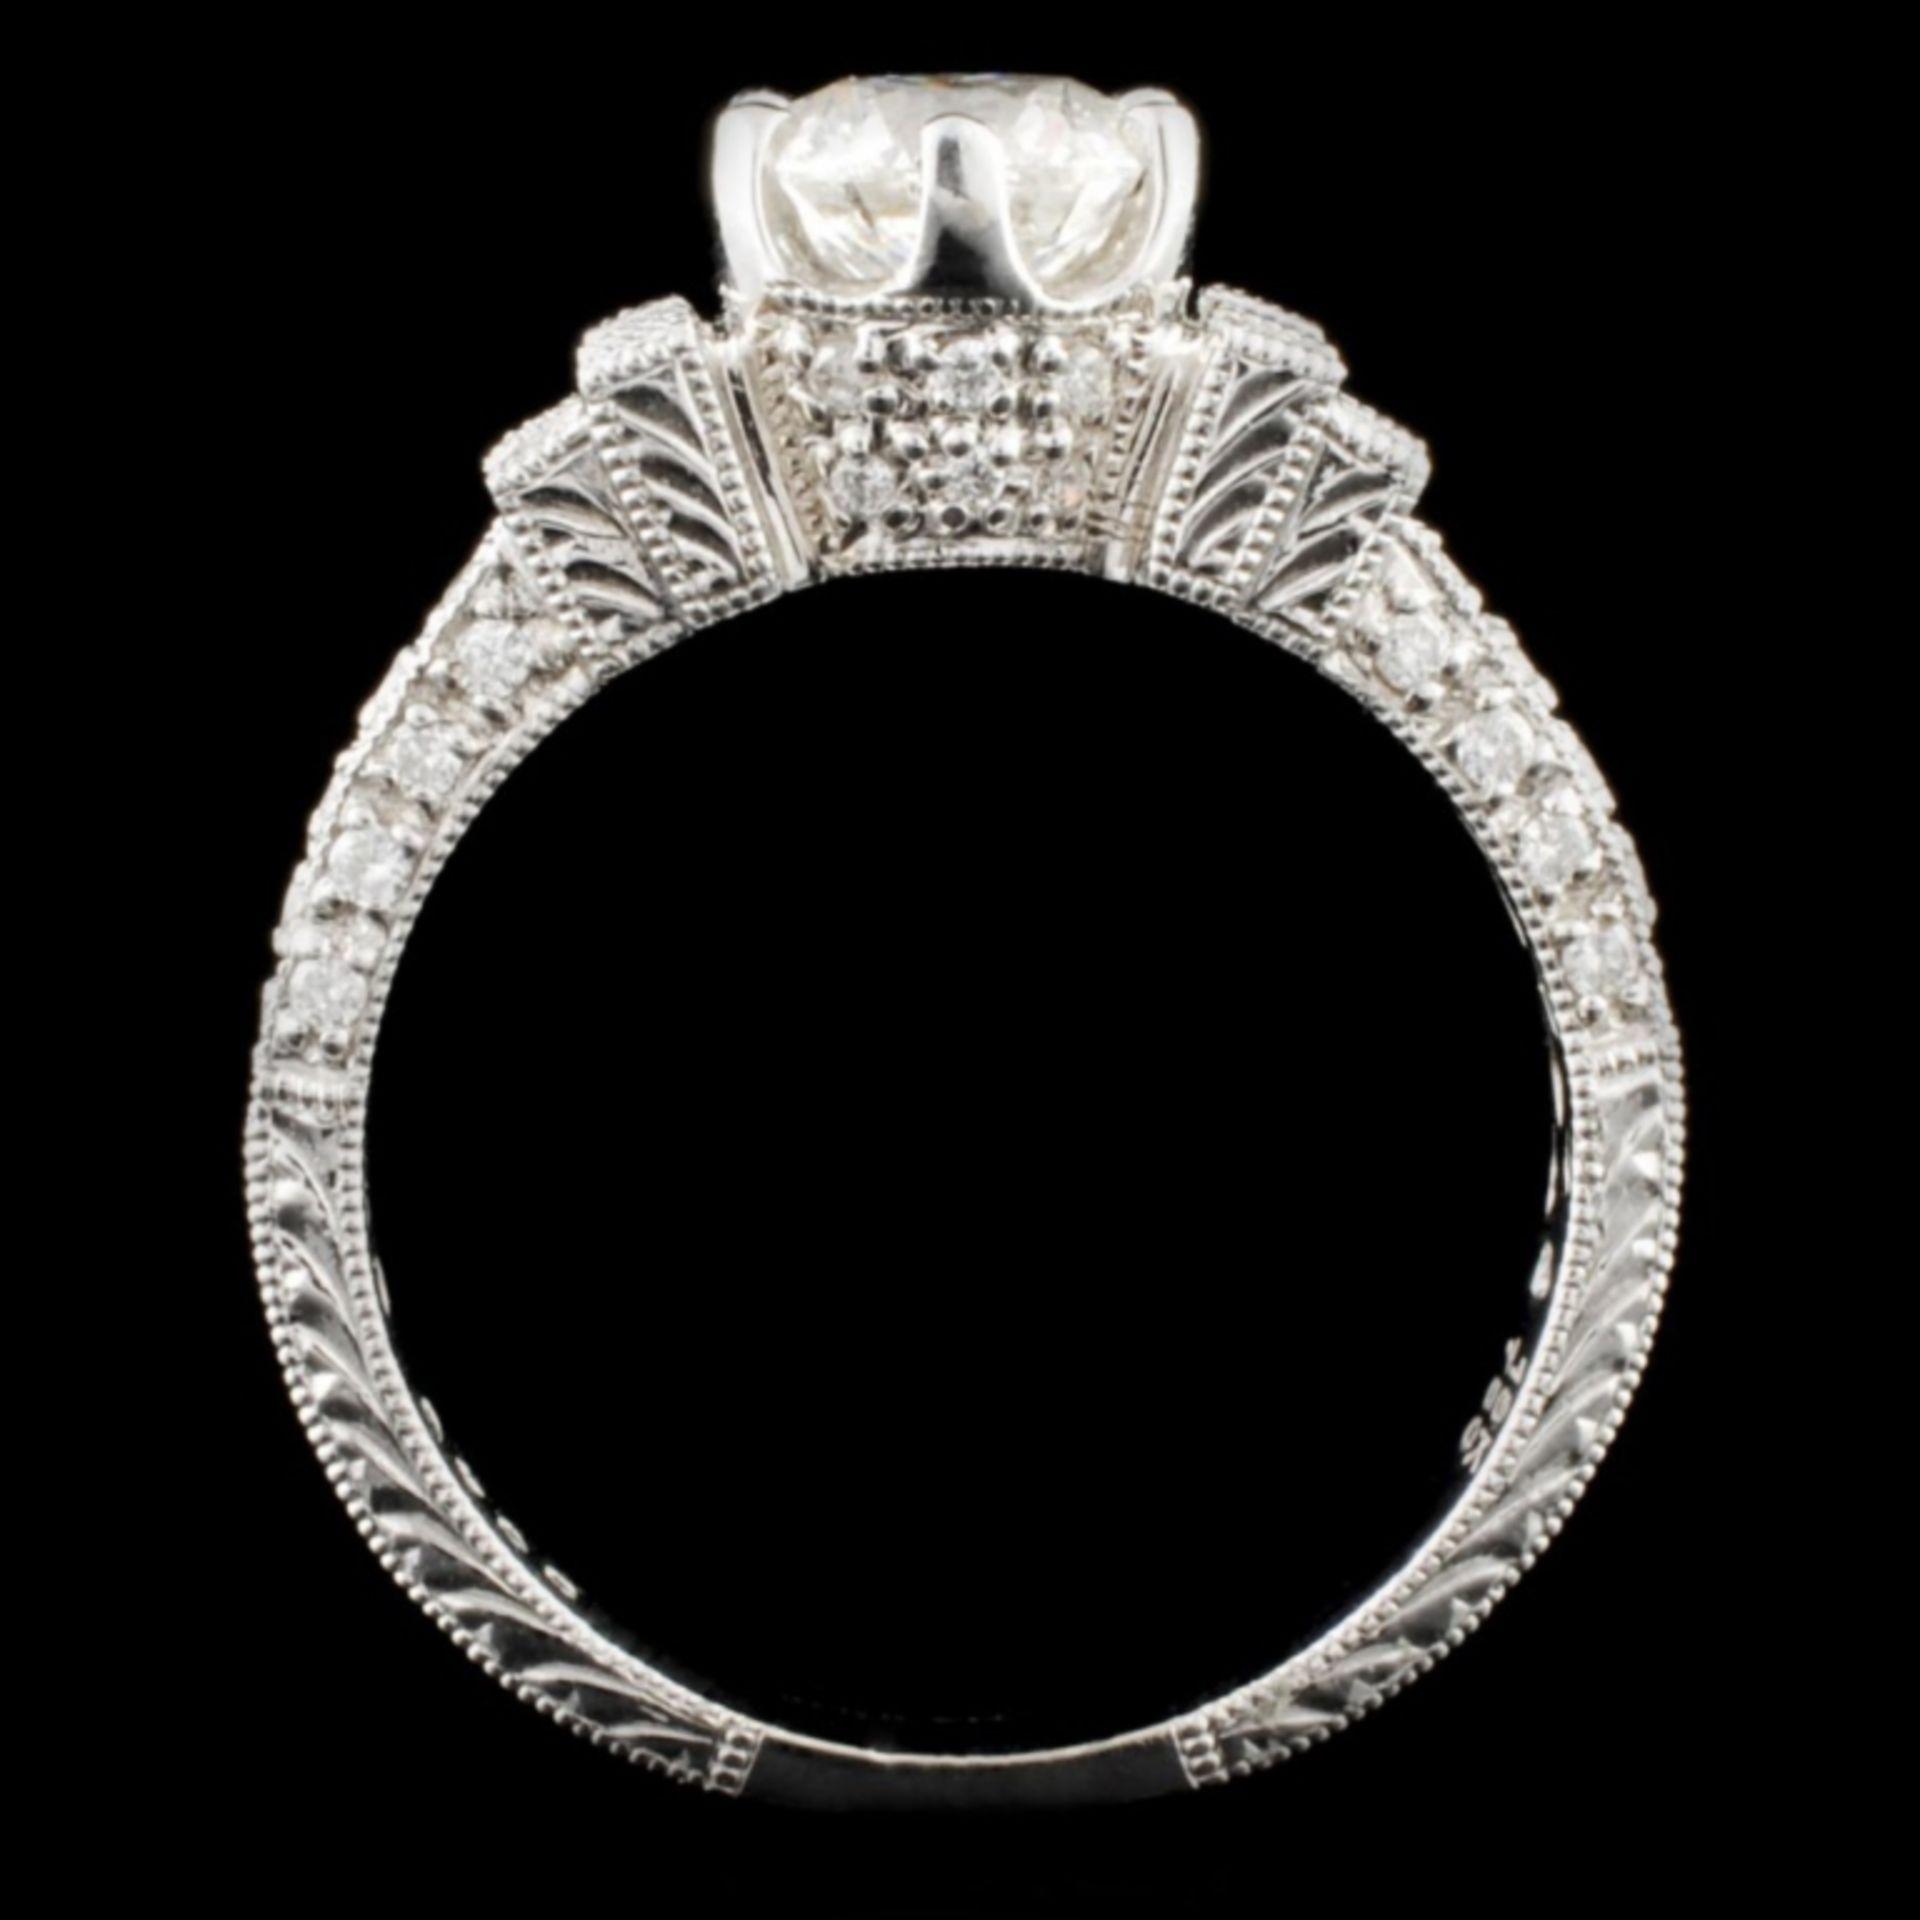 18K Gold 1.33ctw Diamond Ring - Image 3 of 4